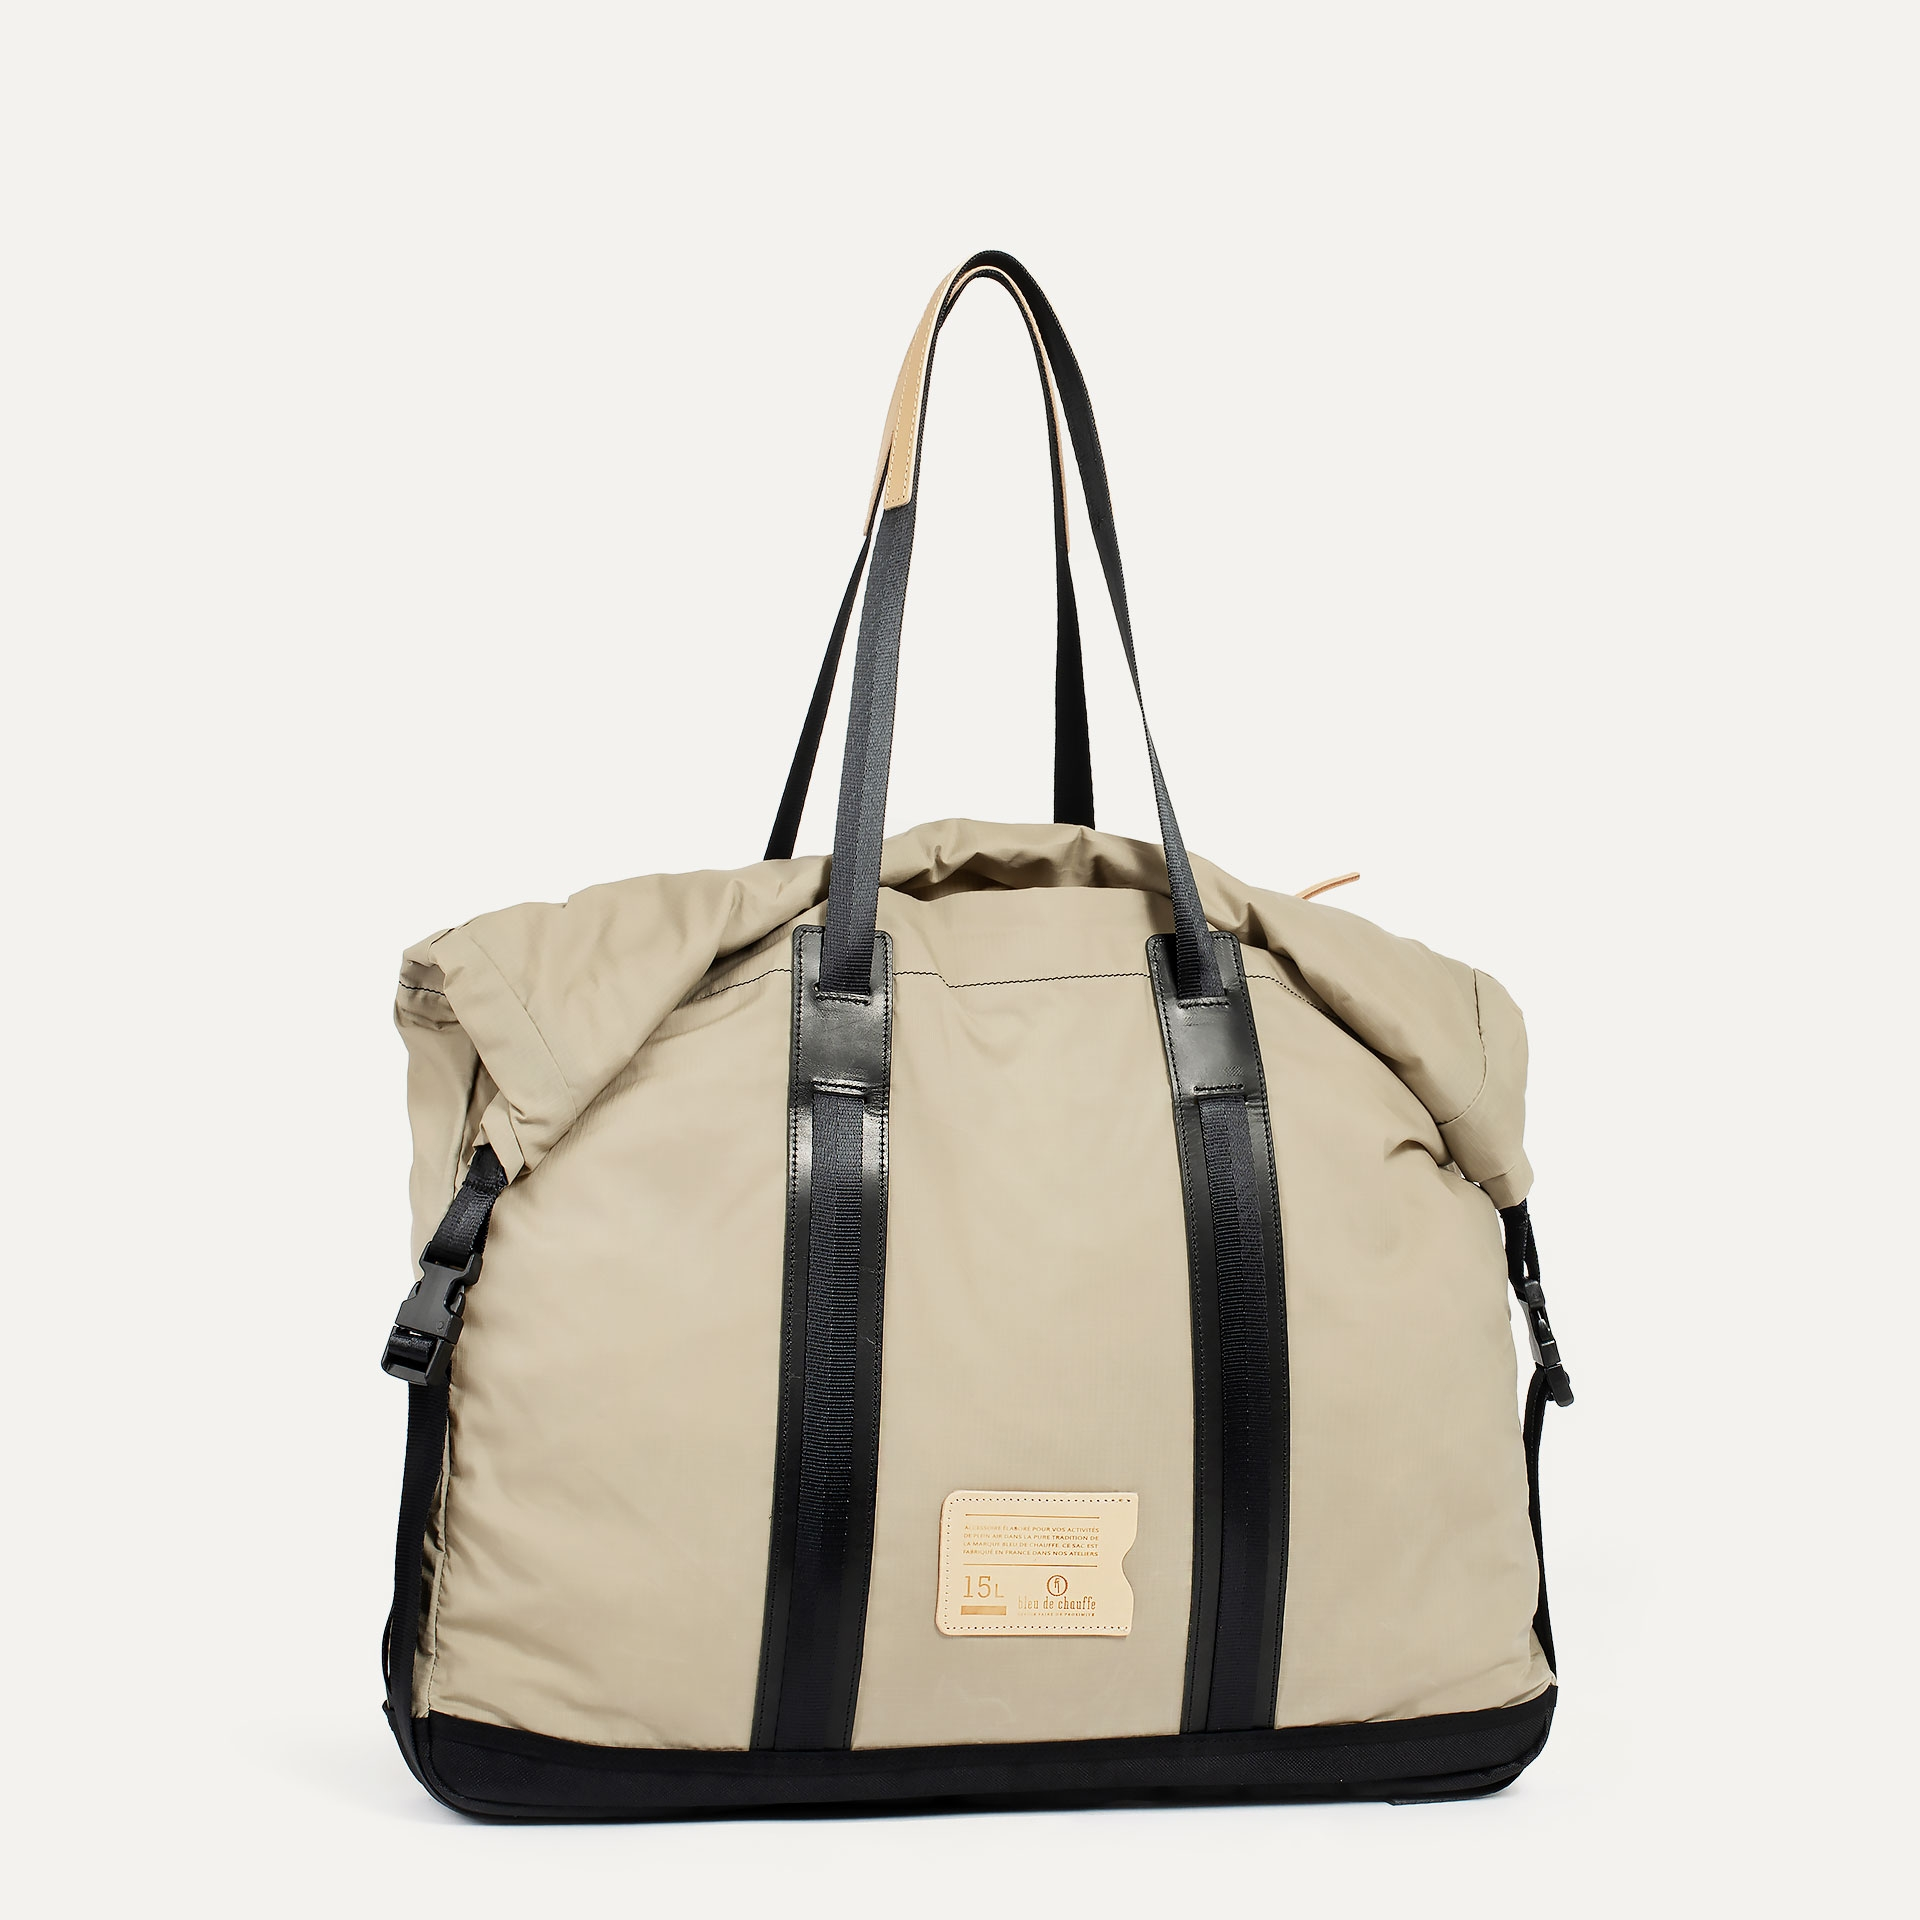 15L Barda Tote bag - Beige (image n°2)